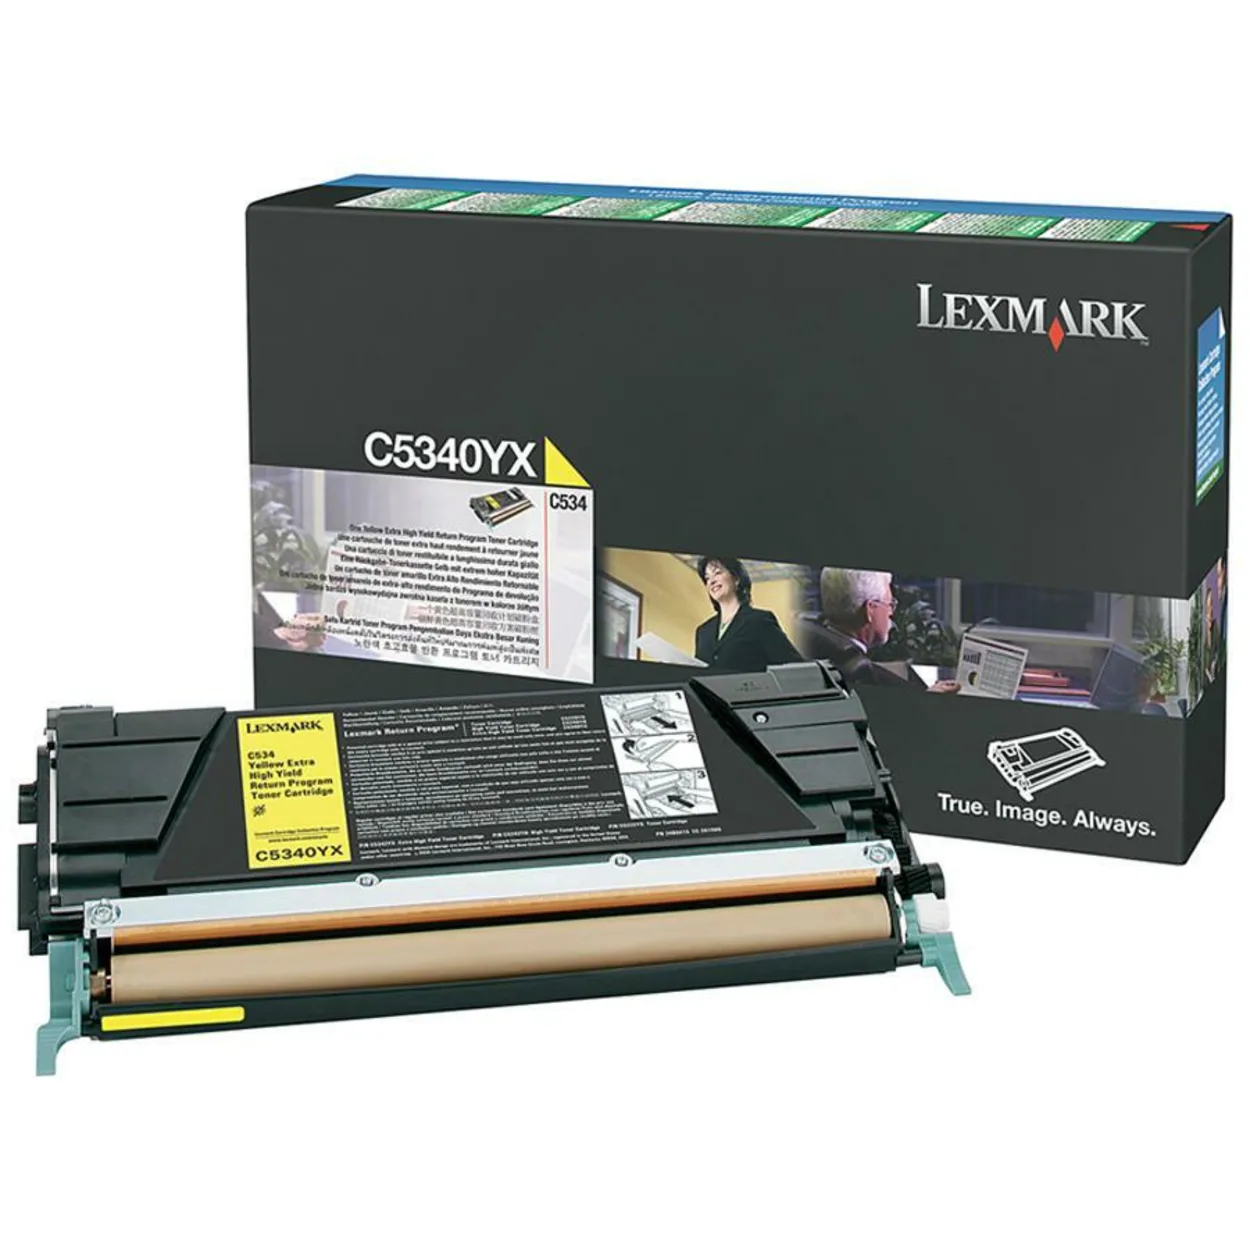 riginal Lexmark C5340YX C534 Return Program Yellow Extra High-Yield Toner Cartridge